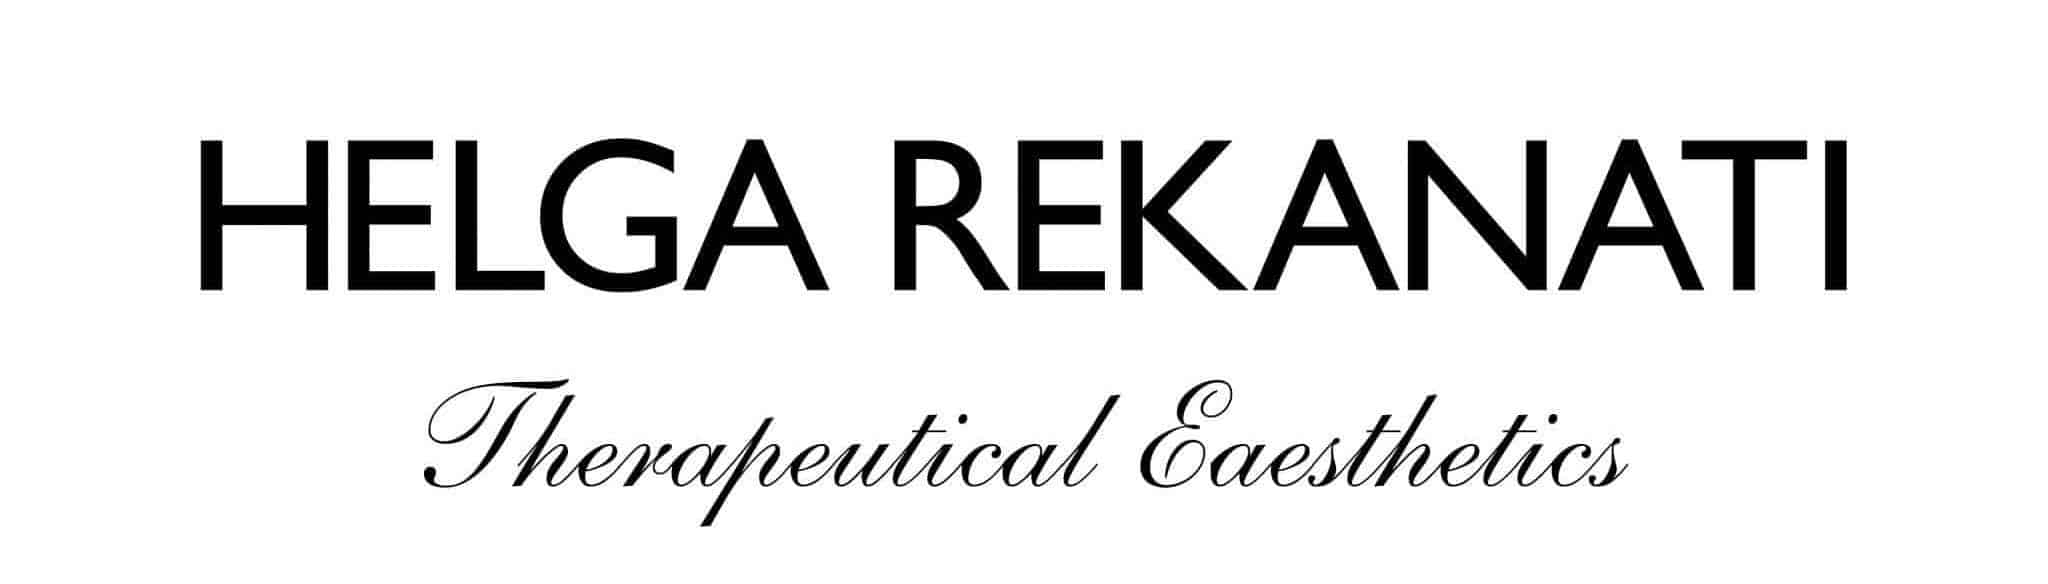 cropped HelgaRekanati logo